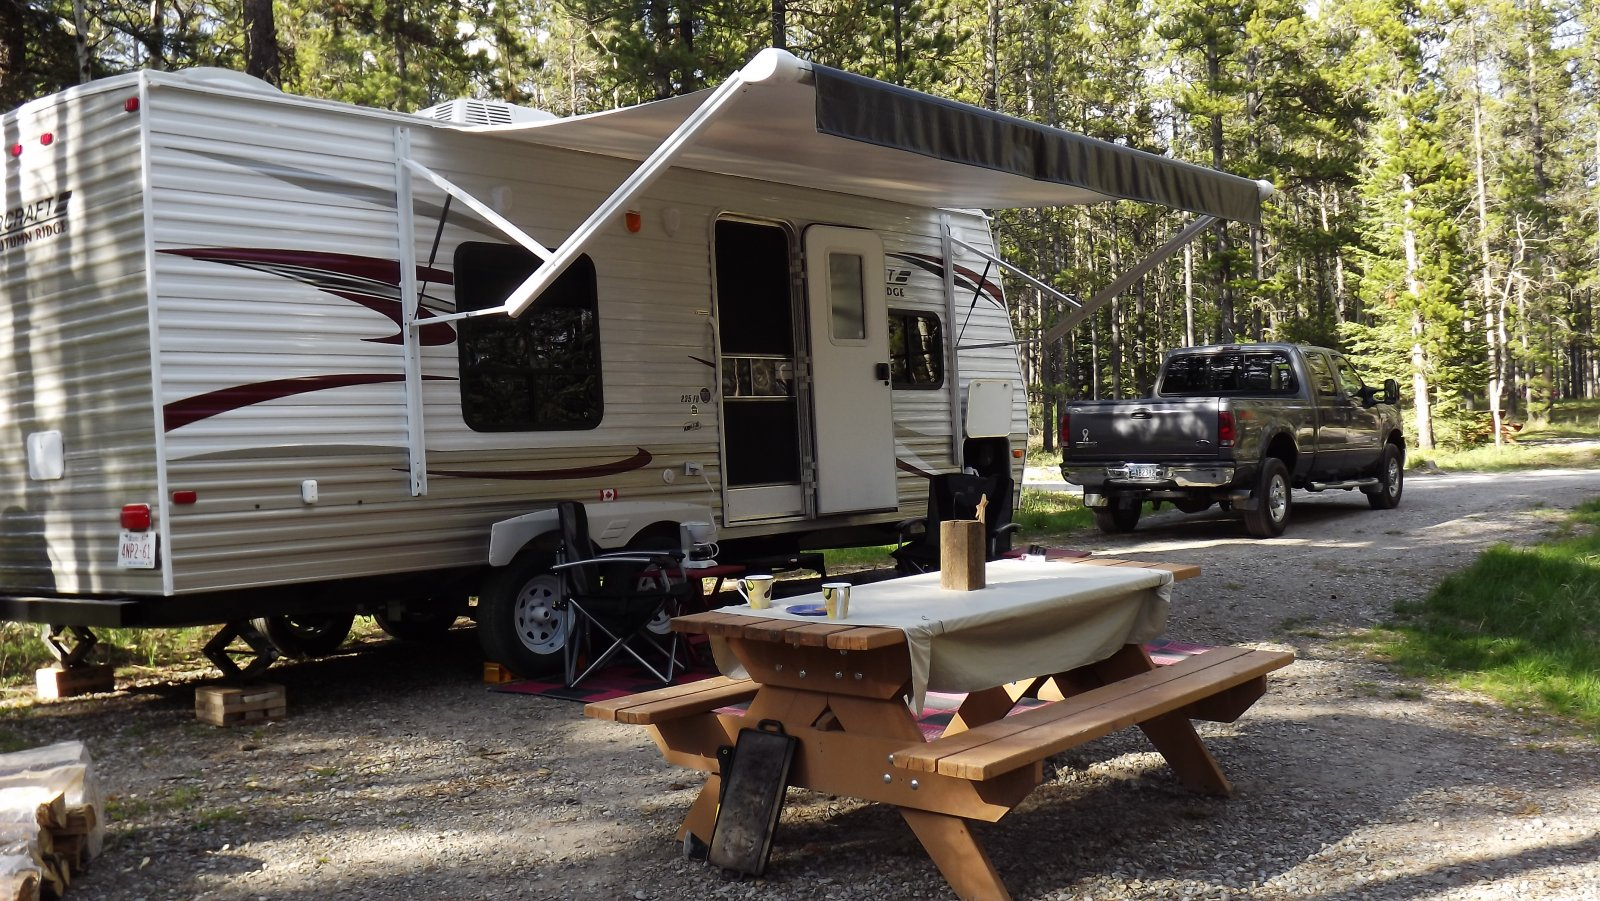 Click image for larger version  Name:Camping Sandy McNabb May 24 2015 070.jpg Views:214 Size:411.7 KB ID:99975